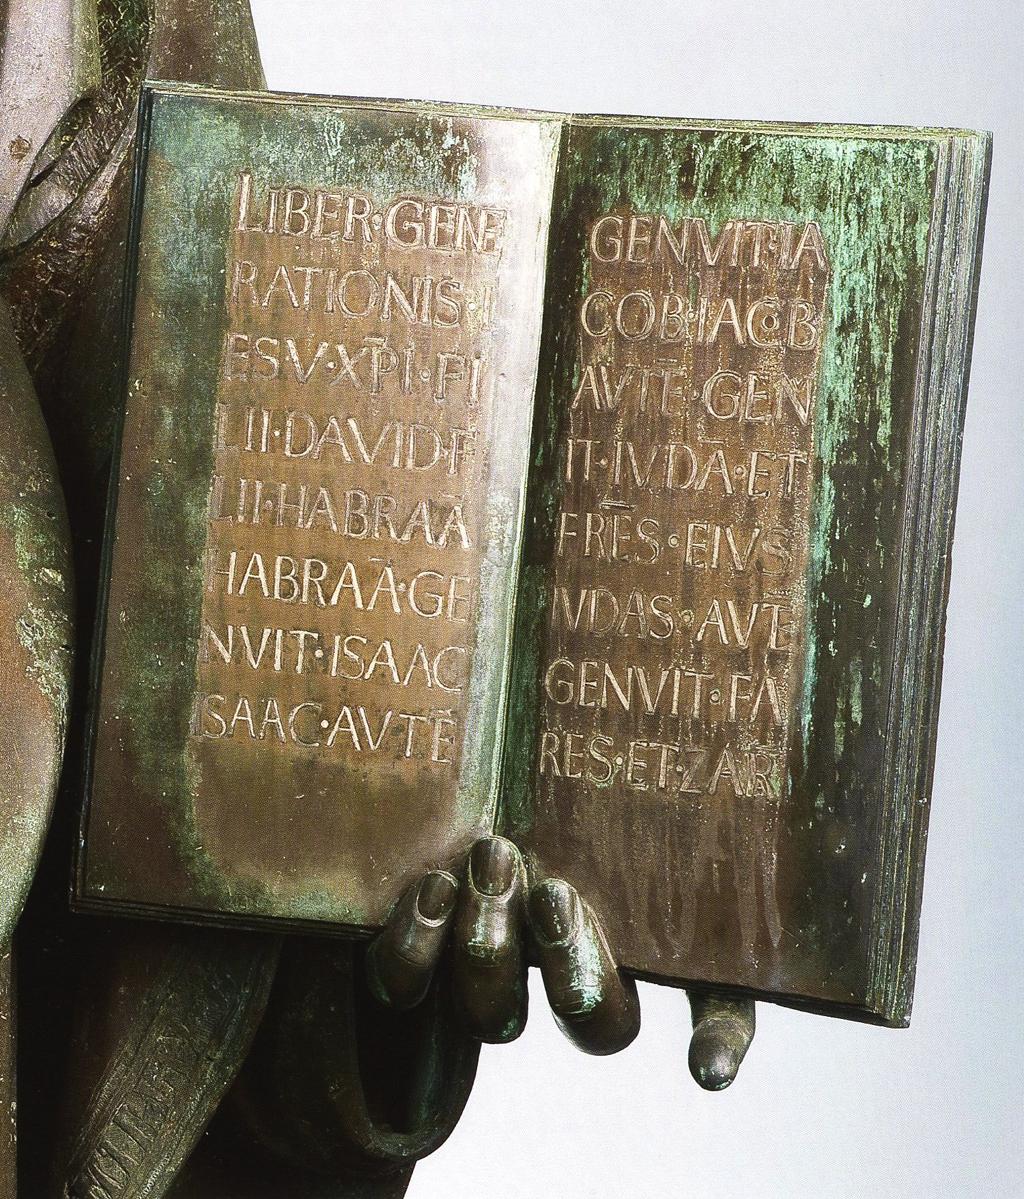 Detail of Statue of St. Matthew by Lorenzo Ghiberti. Note the Florentine Sans serif capitals.